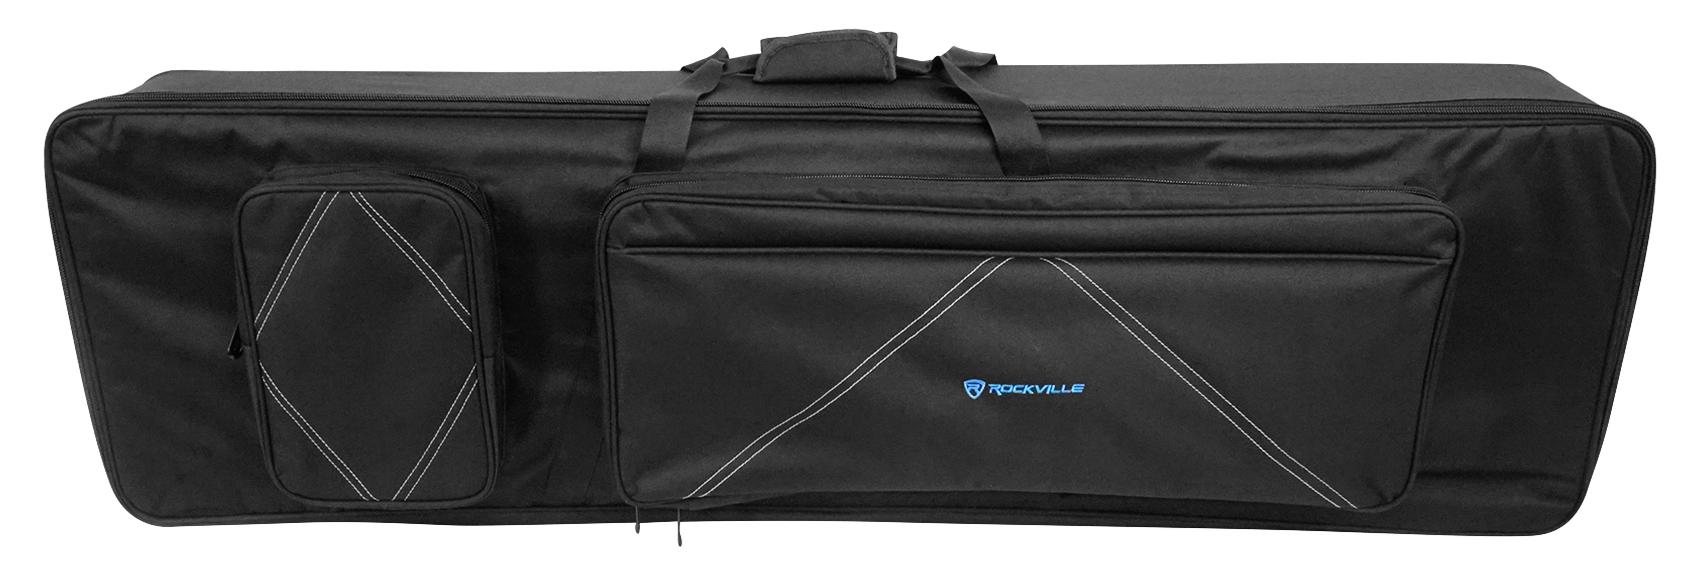 Rockville 88 Key Slim Padded Rigid Keyboard Gig Bag Case For KORG SP-500